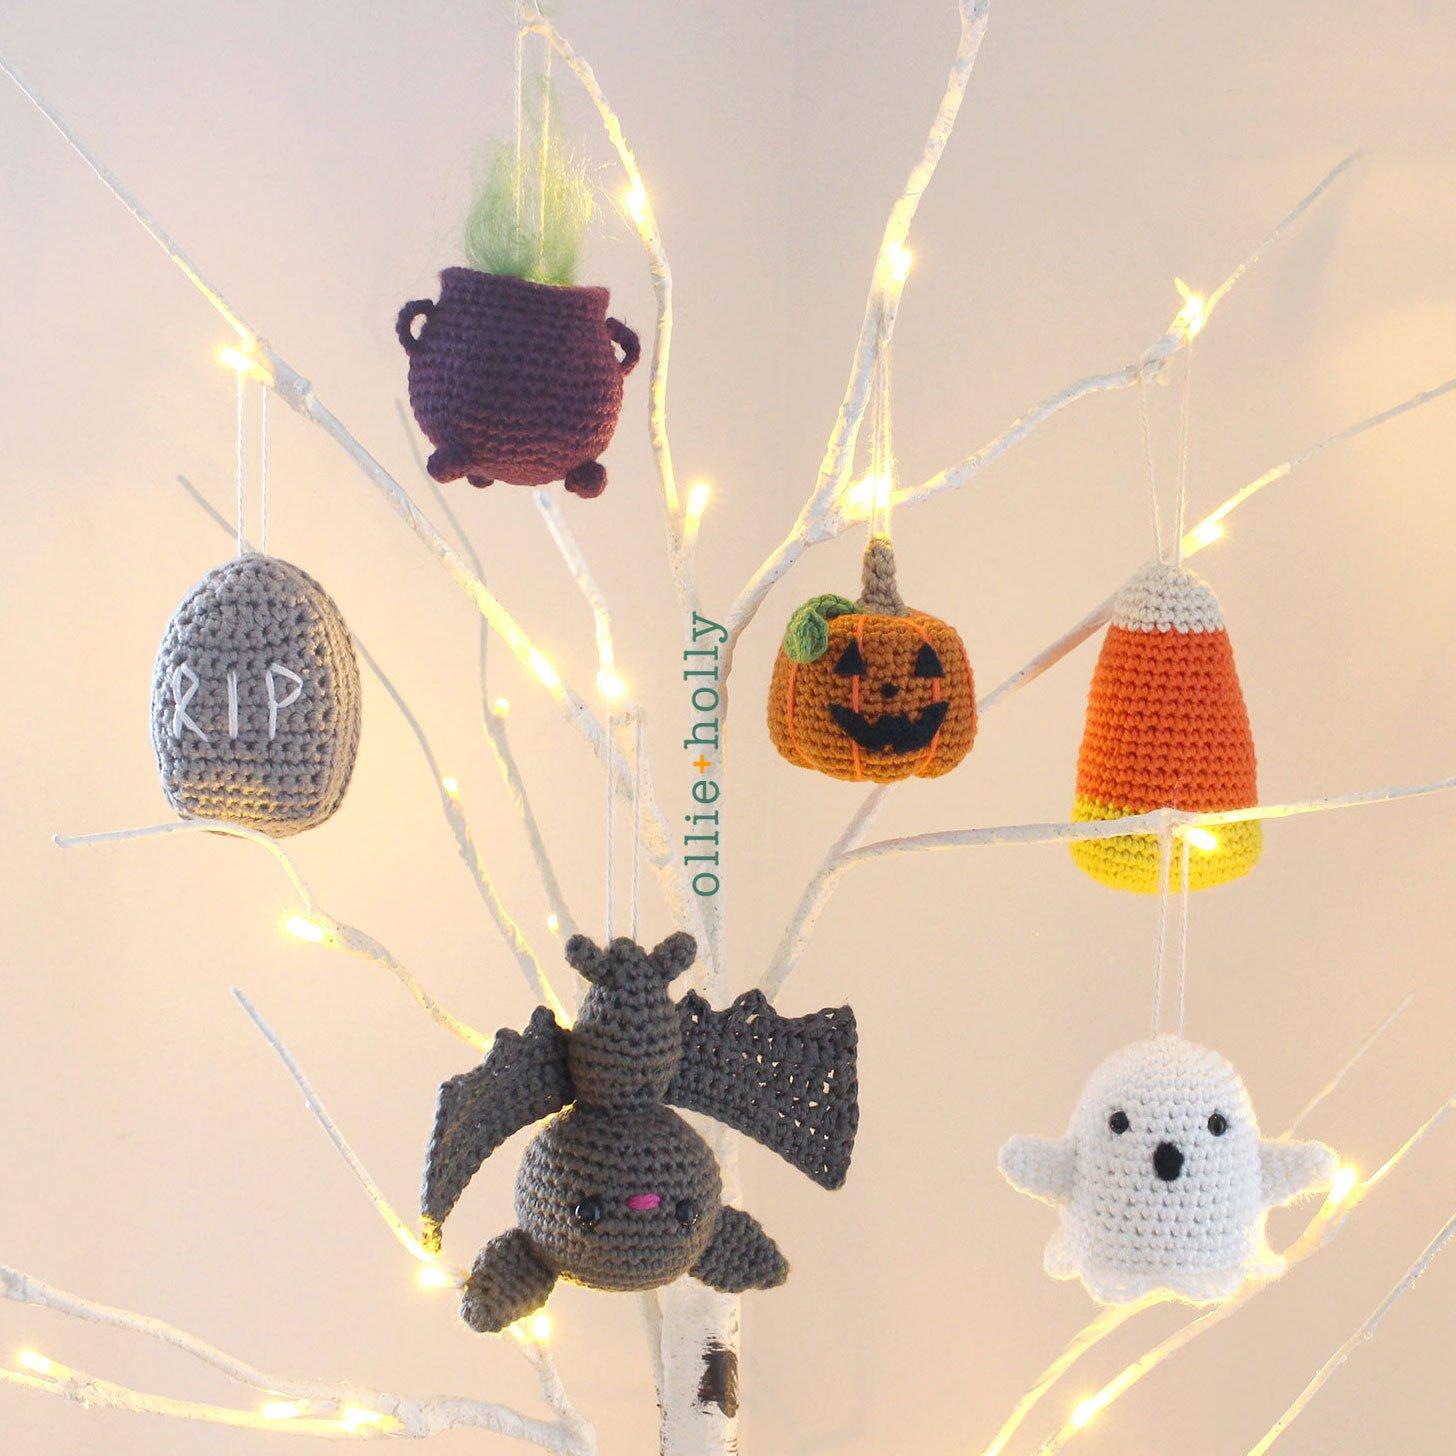 Baby Knitting Patterns Adorable Halloween Amigurumi - #Adorable ... | 1456x1456